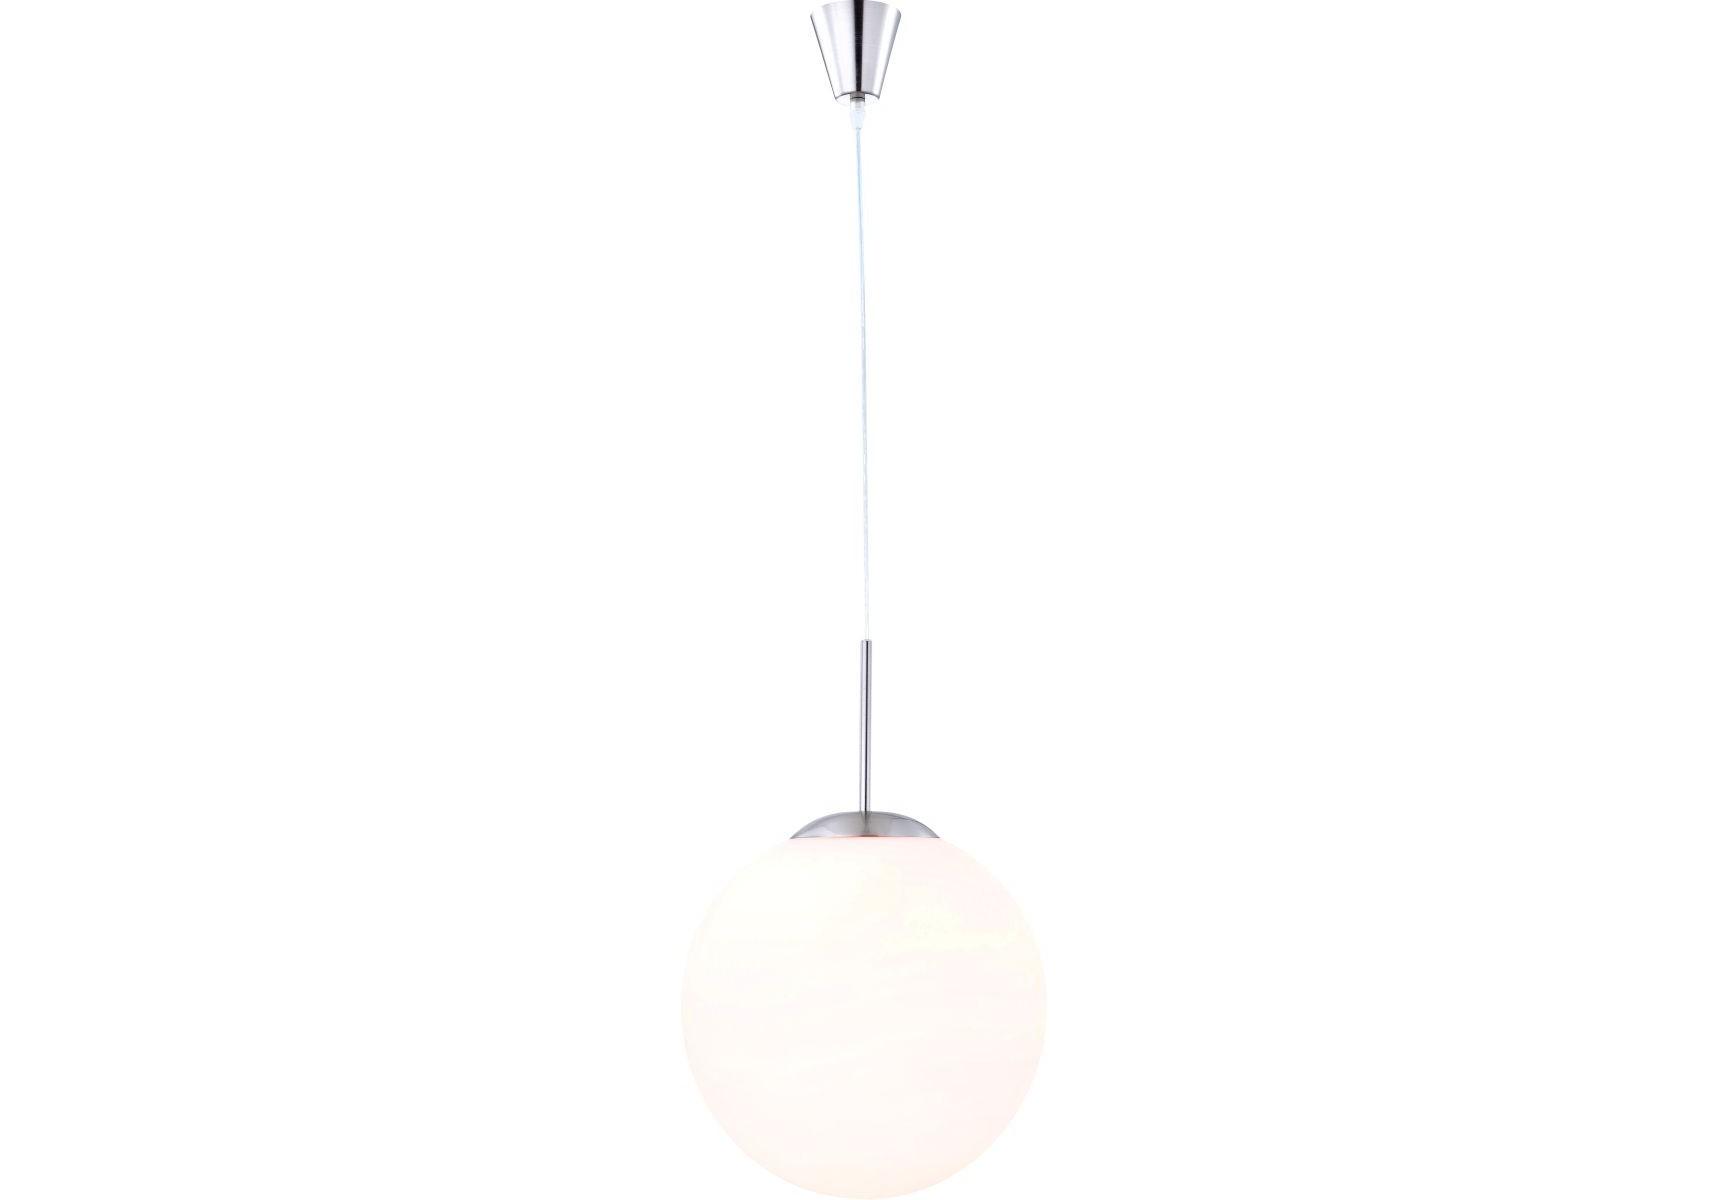 Светильник подвеснойПодвесные светильники<br>Цоколь: E27Мощность: 60WКоличество ламп: 1<br><br>kit: None<br>gender: None